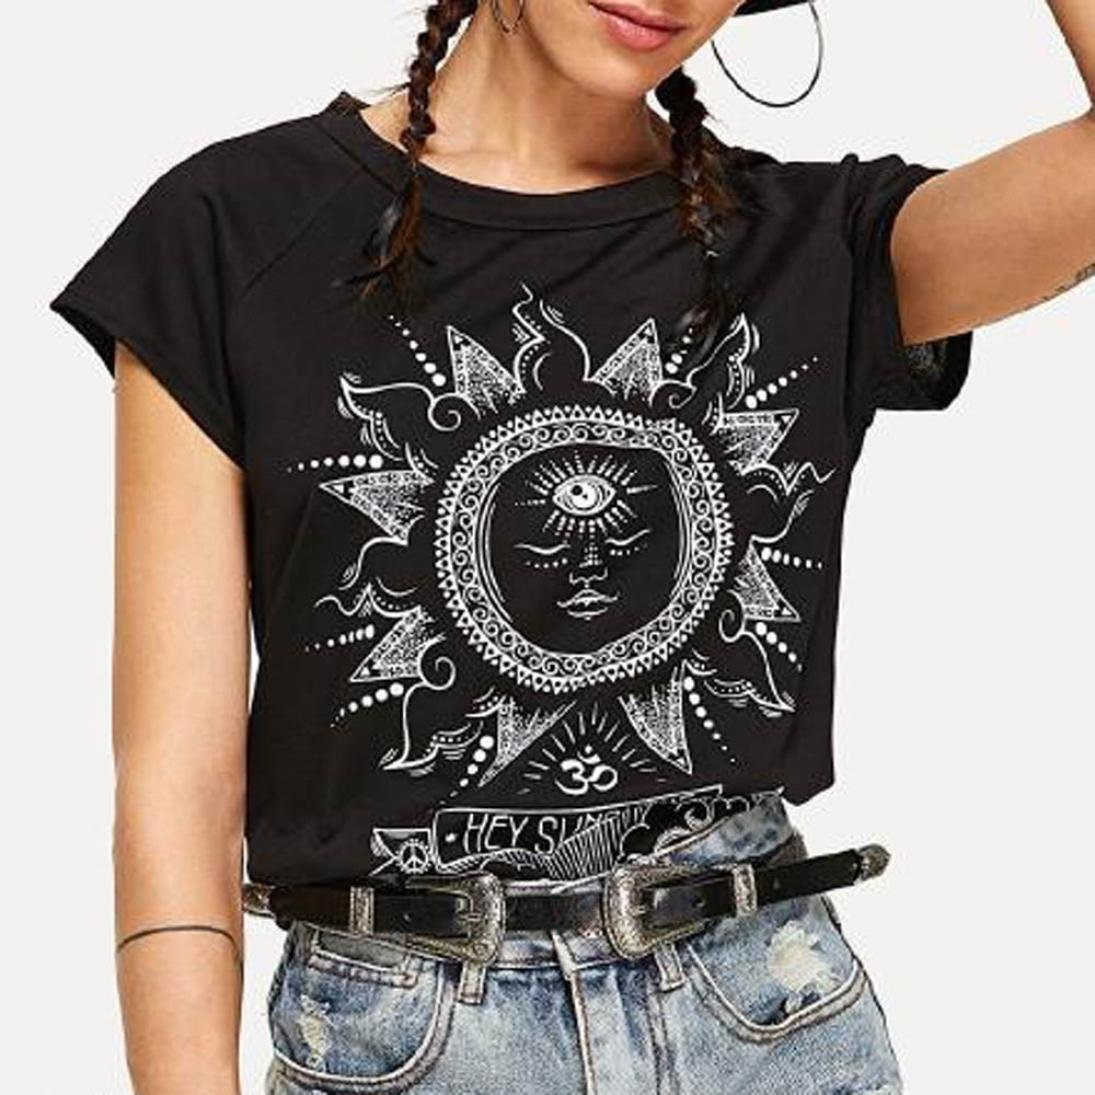 Amazon.com: Limpieza. Litetao New En venta.! Camiseta de ...